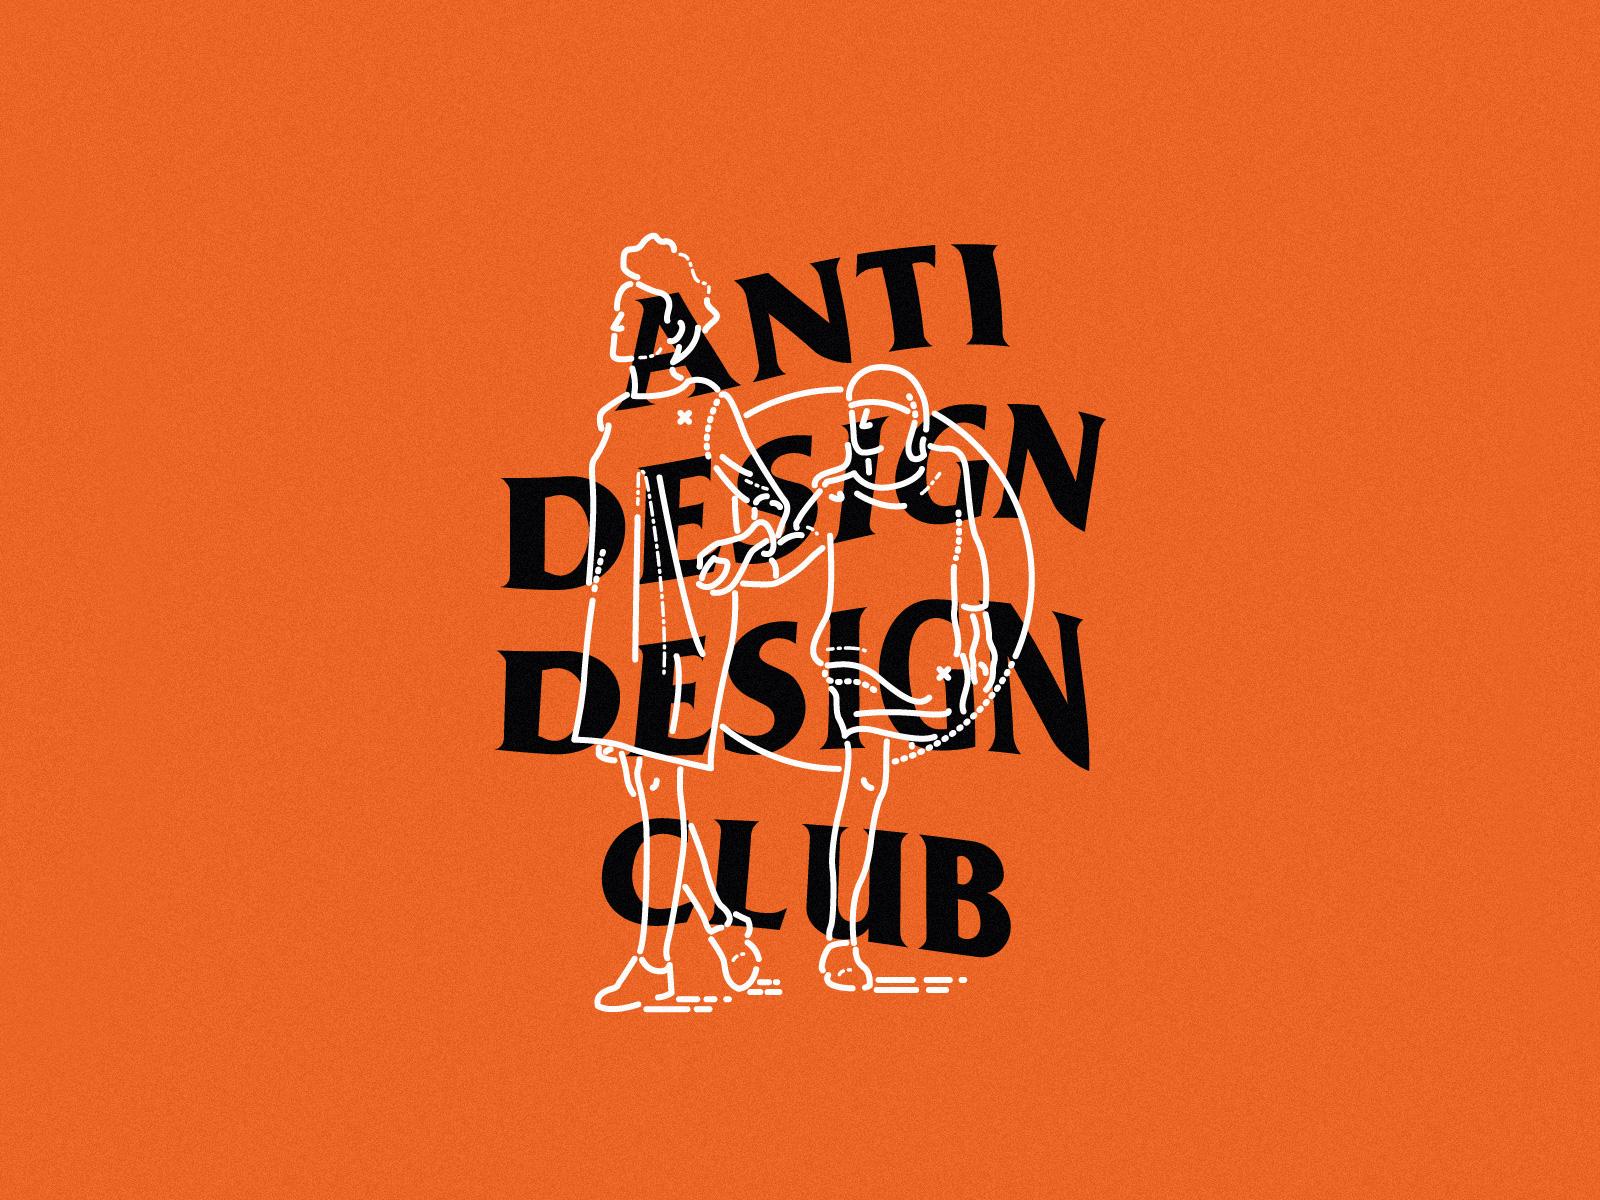 Anti design club